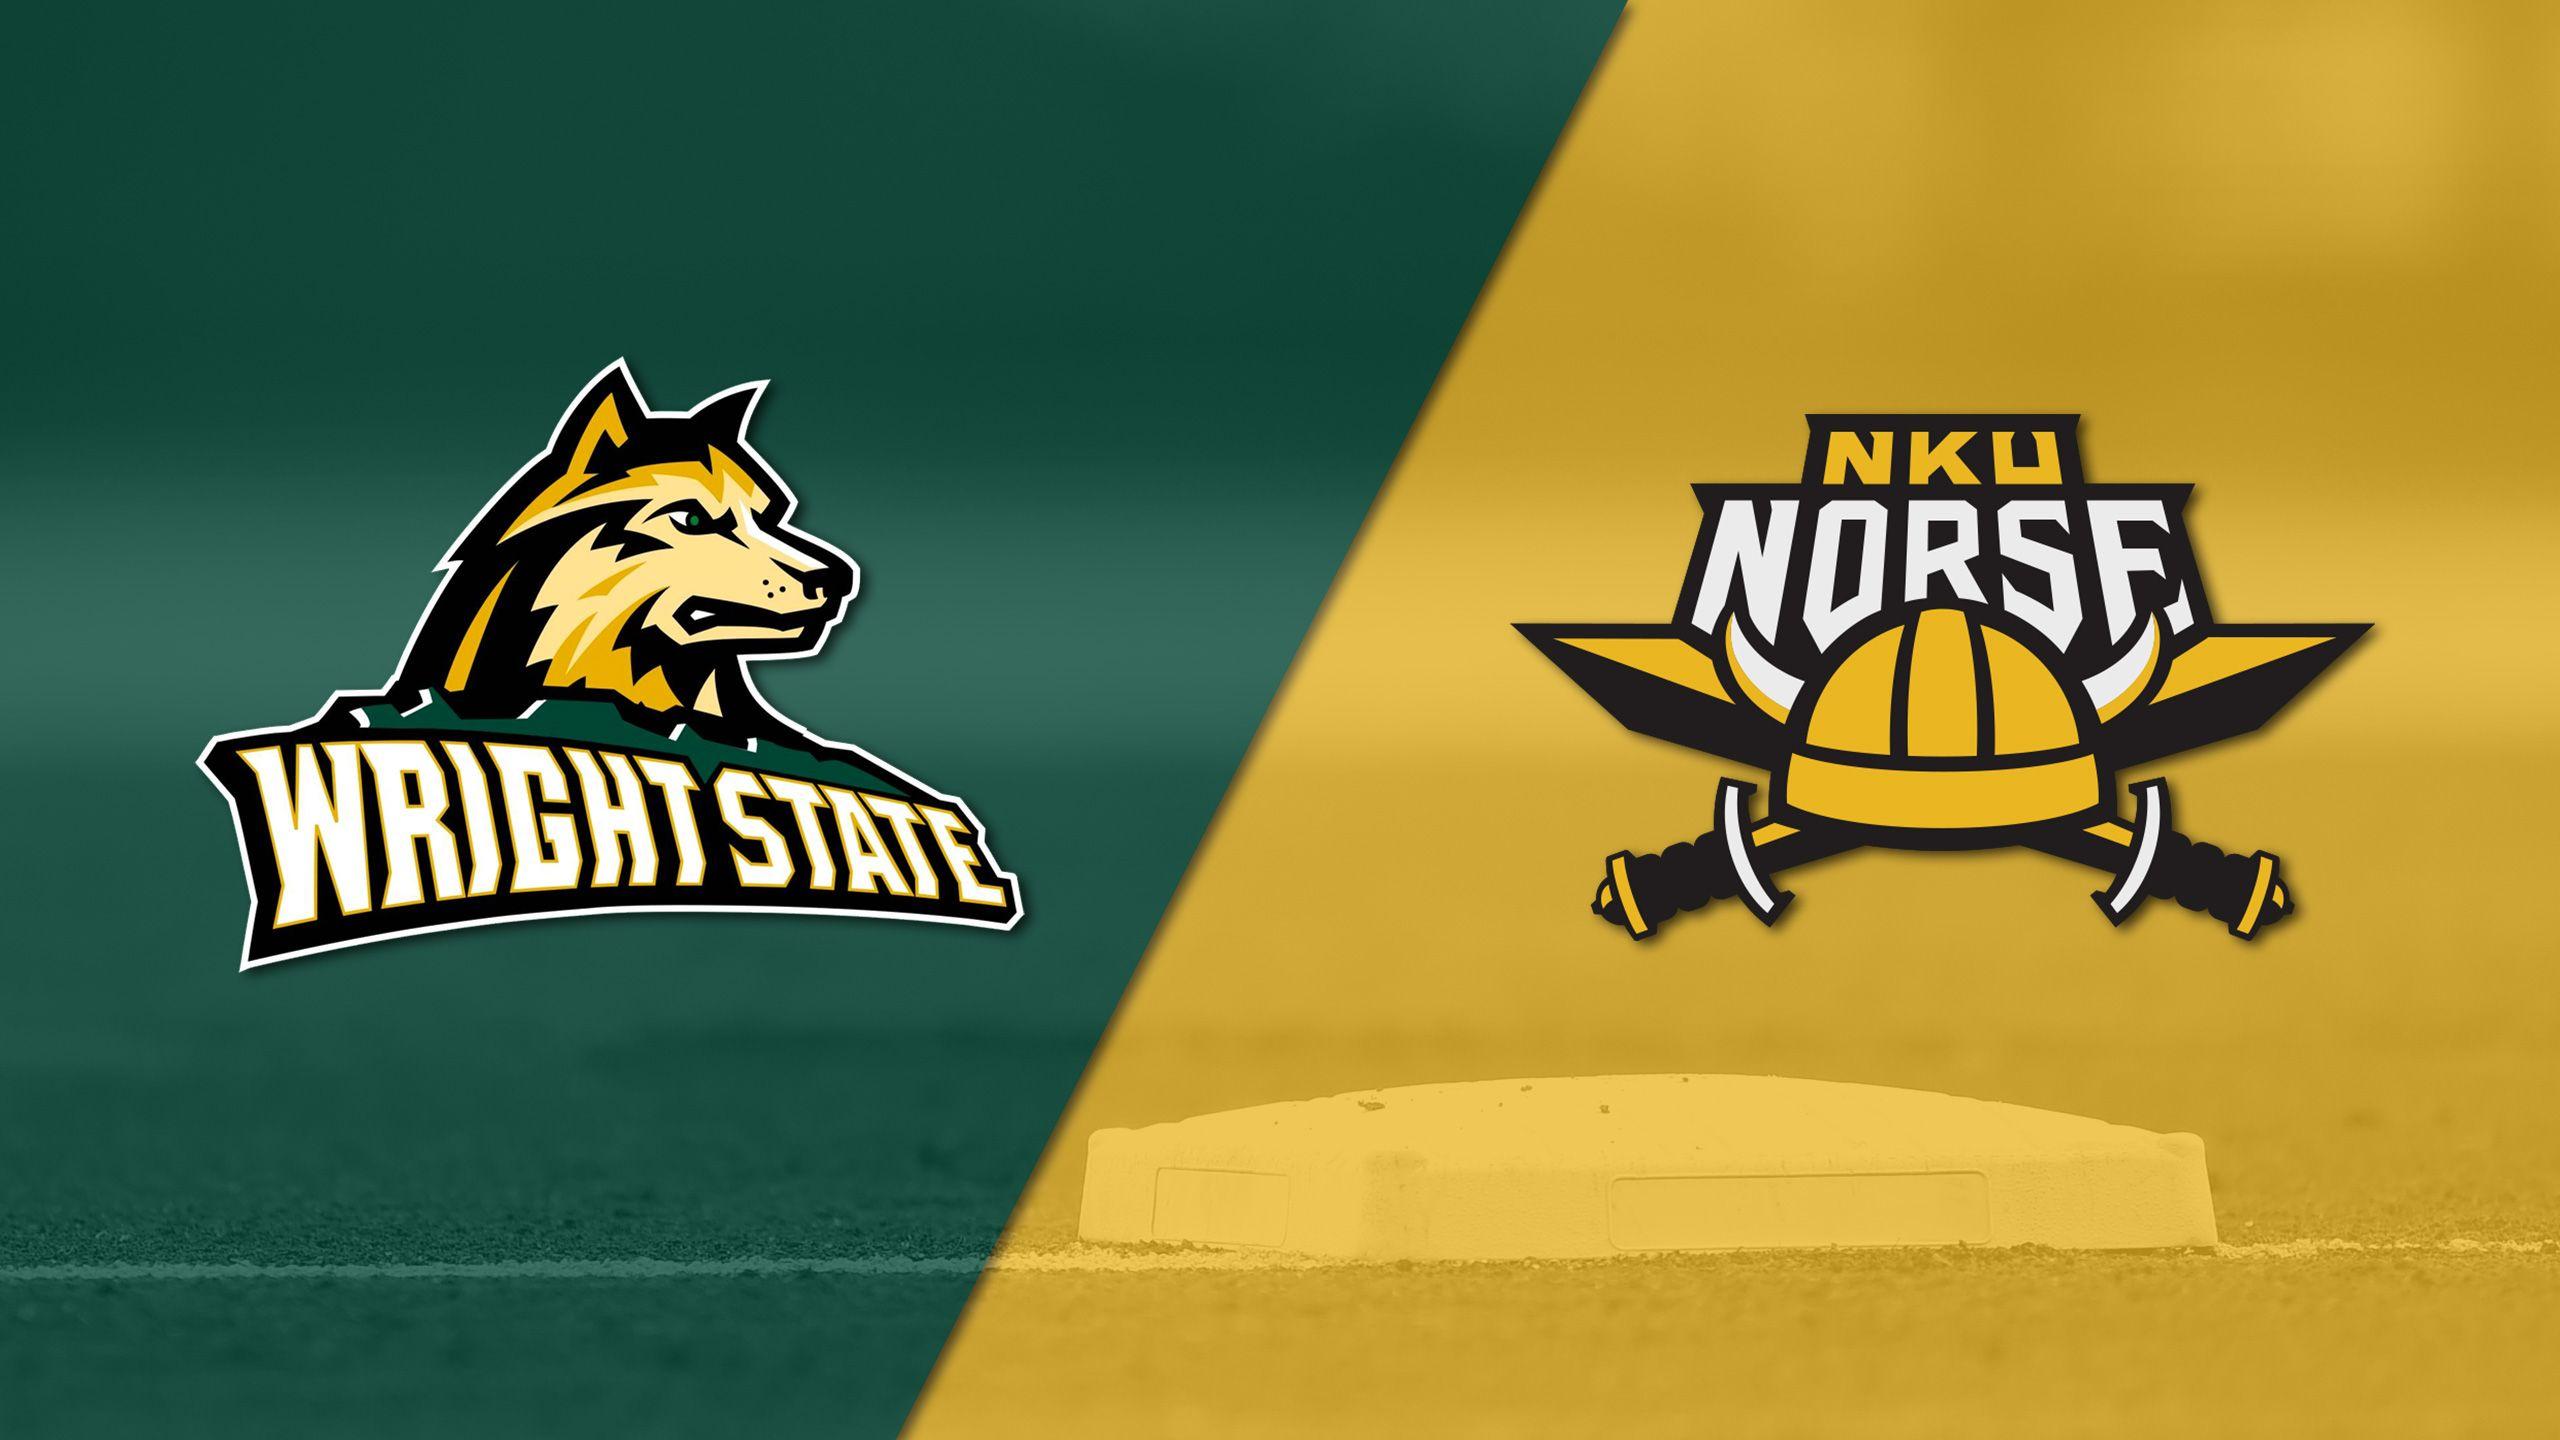 Wright State vs. Northern Kentucky (Baseball)